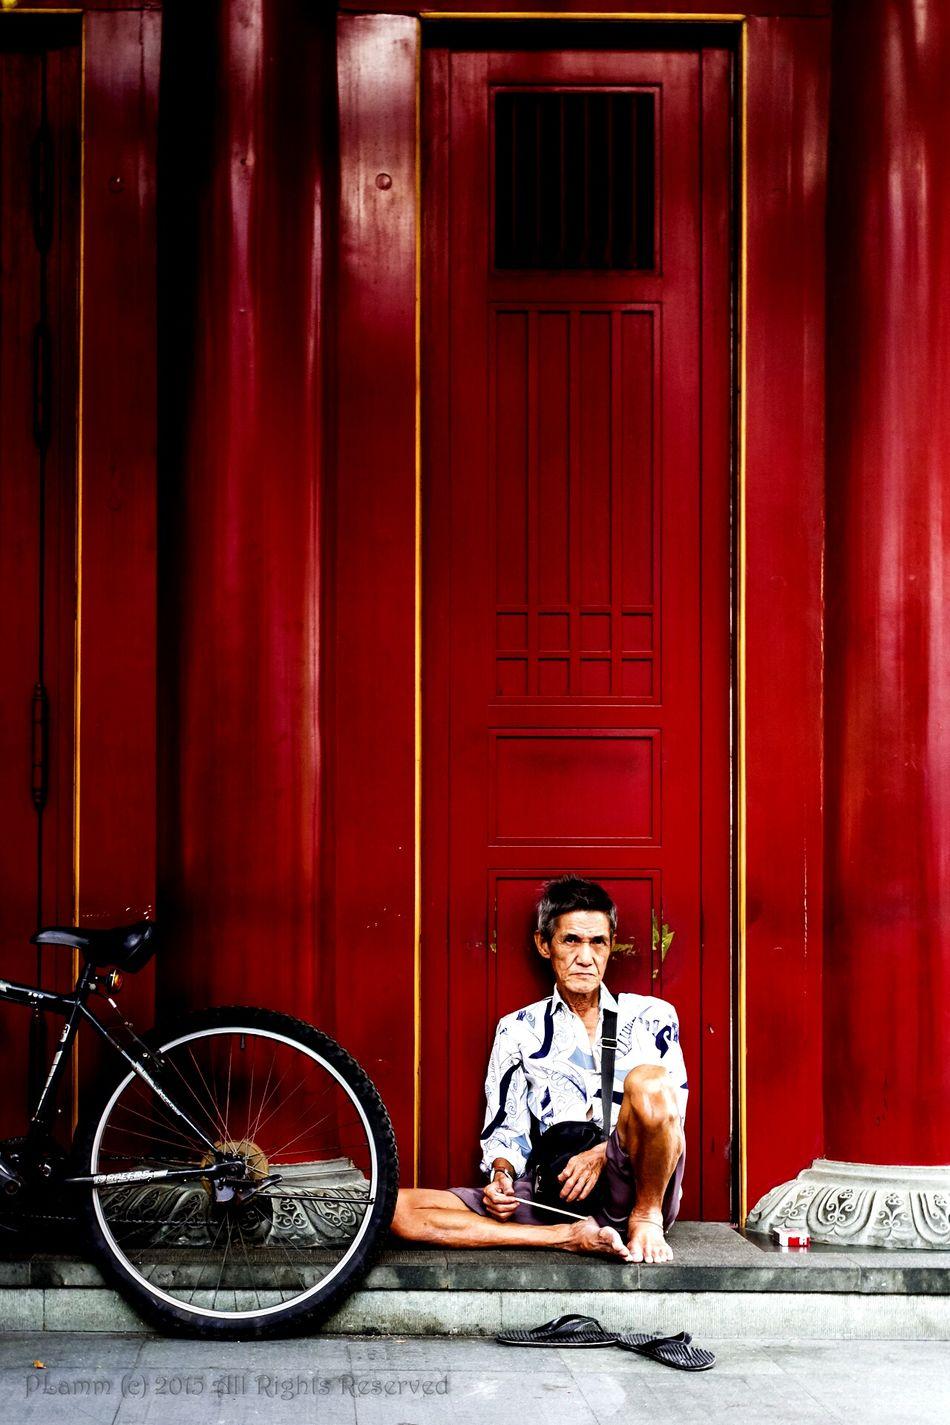 temple guard. EyeEm , EyeEmChinatownPhotowalk , Temple , Door , Red , Street, Old, Man